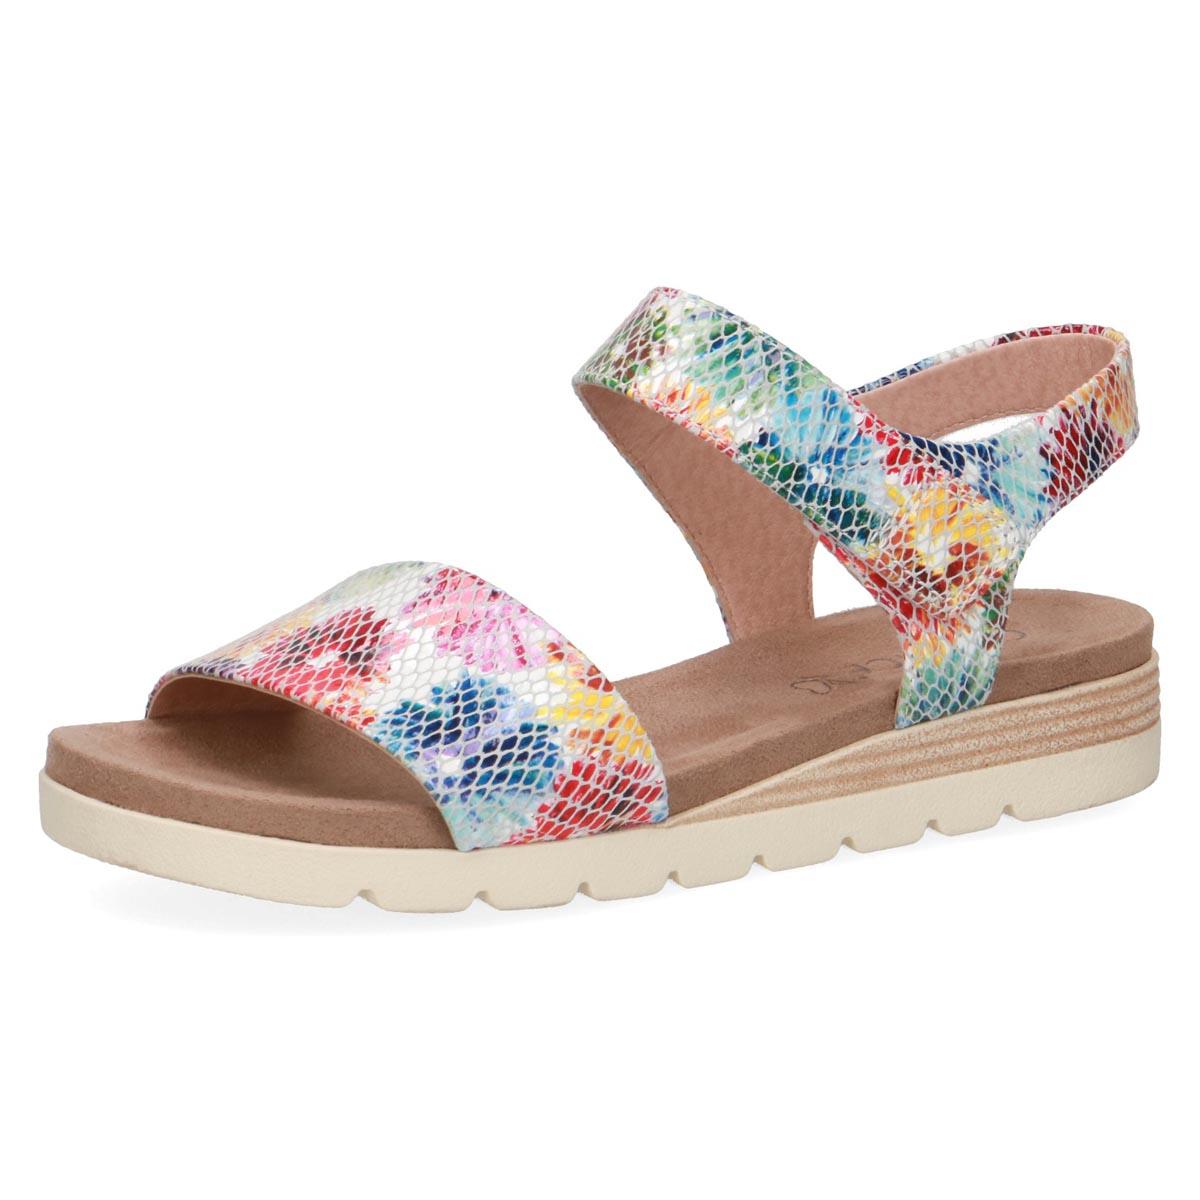 Caprice - Lola Multi Summer Sandal